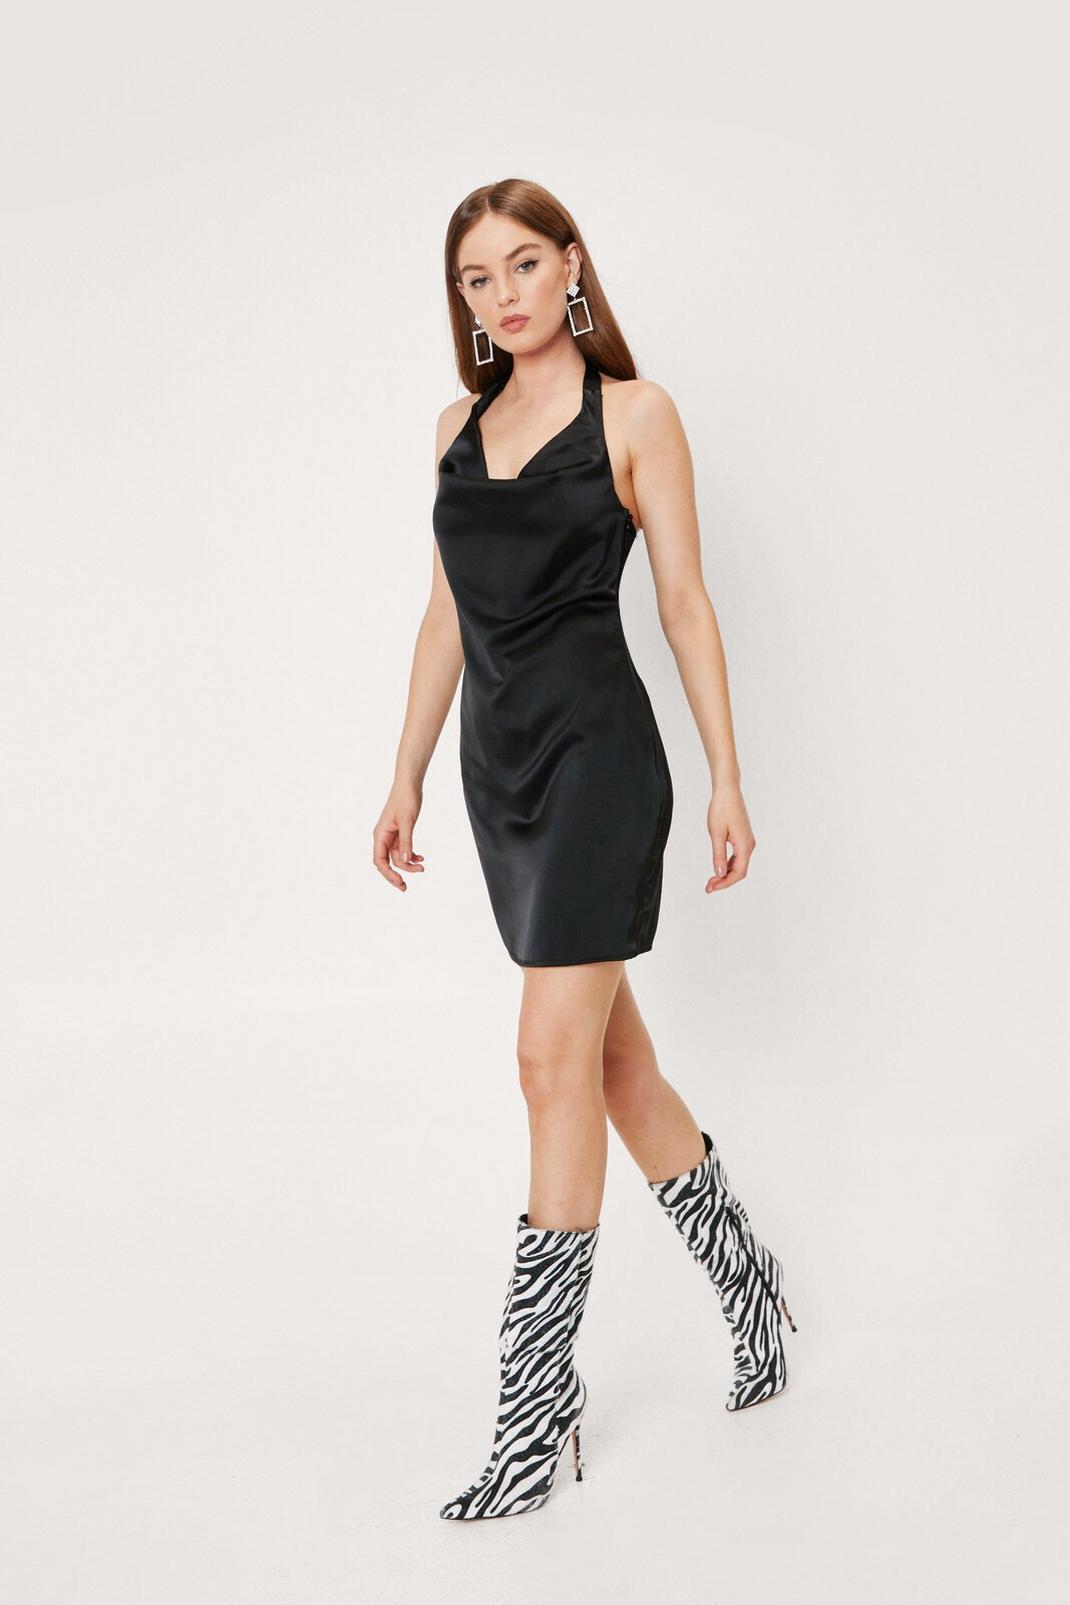 Black Satin Halter Mini Dress